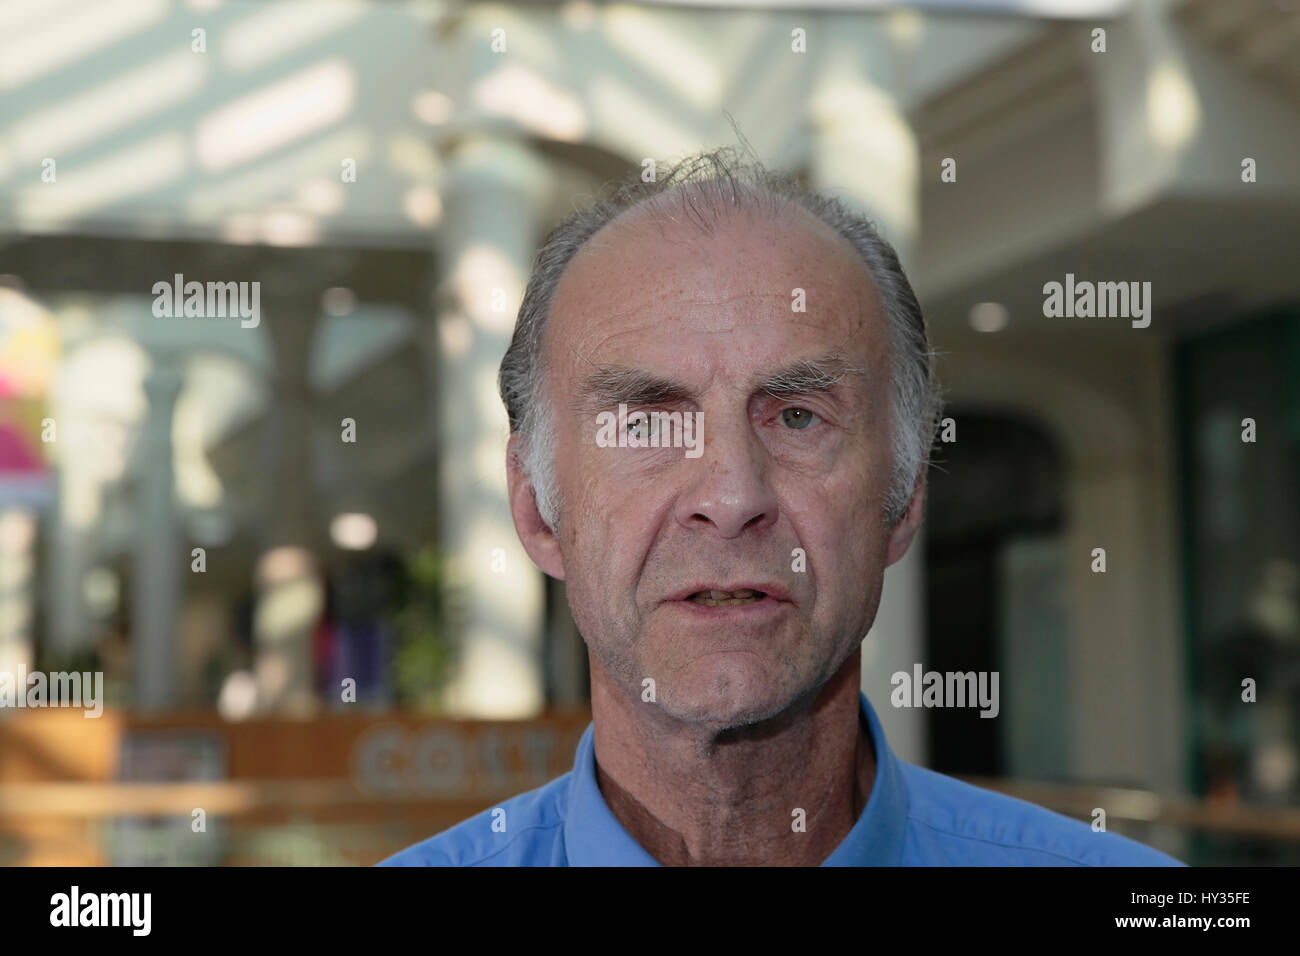 People, Male, Celebrity, Portrait of explorer Sir Ranulph Fiennes. - Stock Image